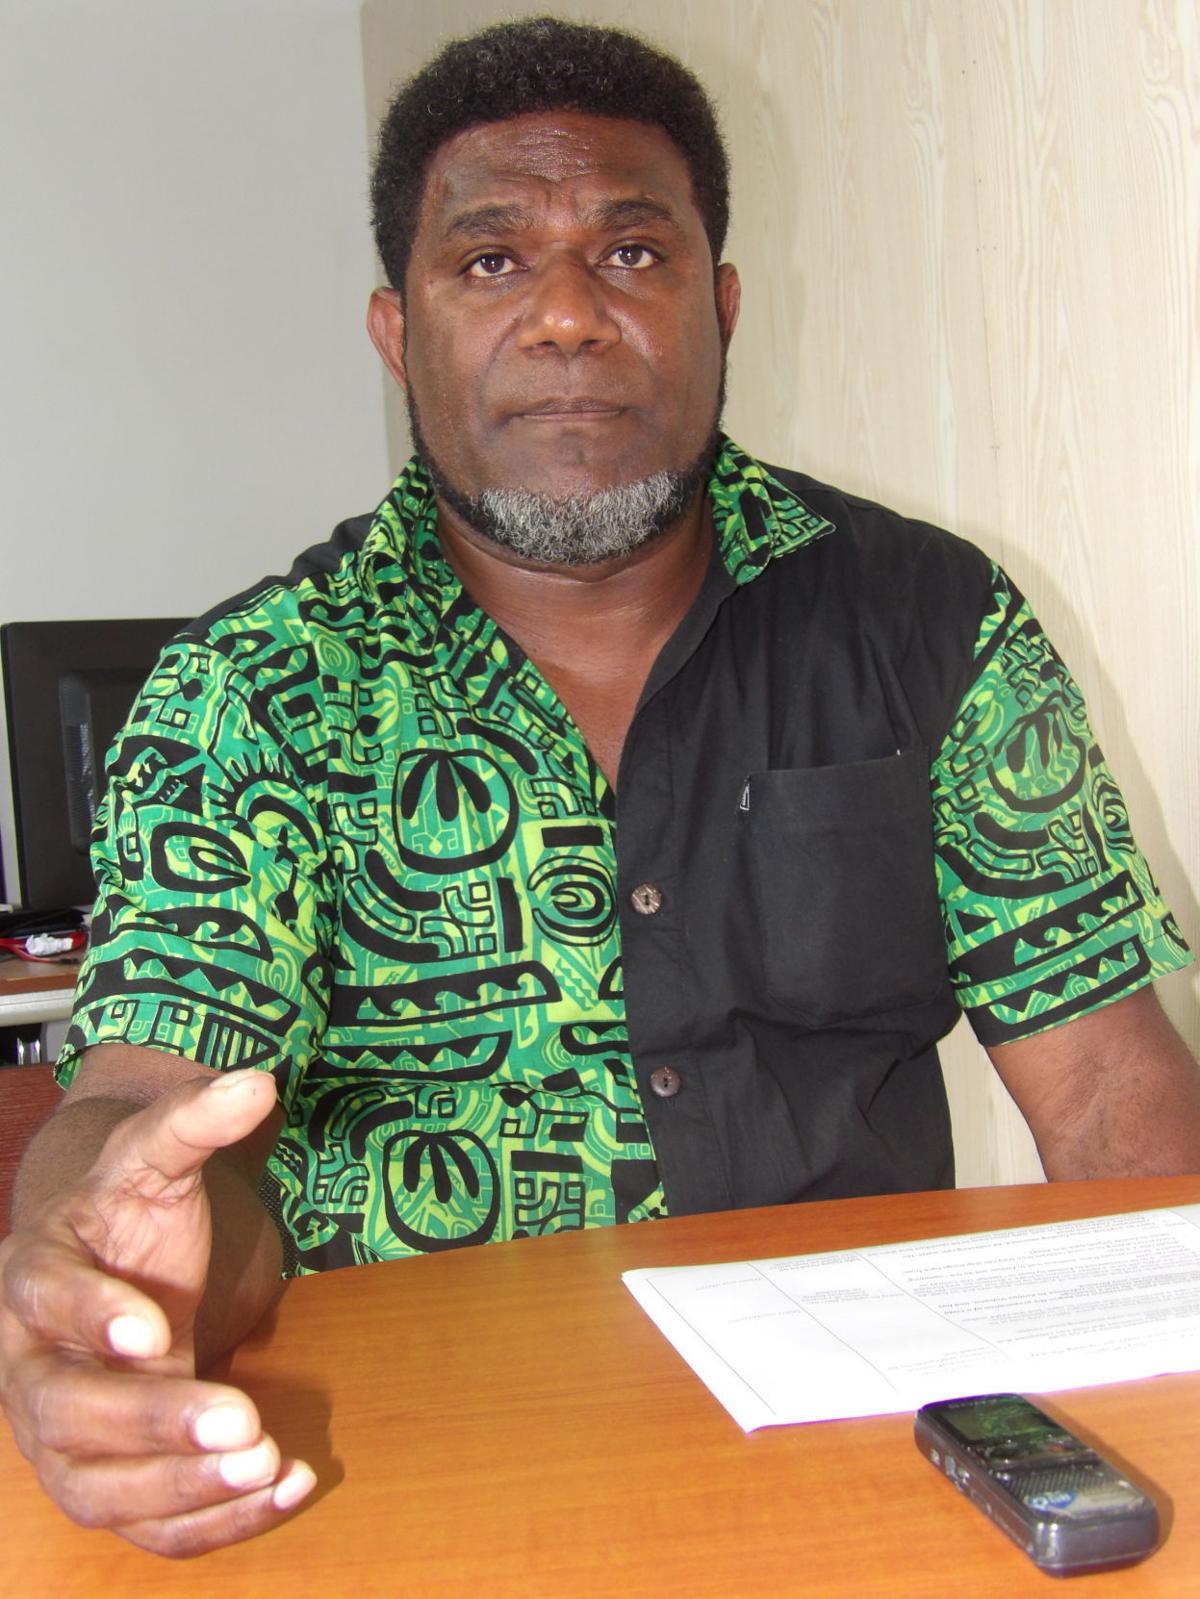 MP KOANAPO RESIGNS AS PS